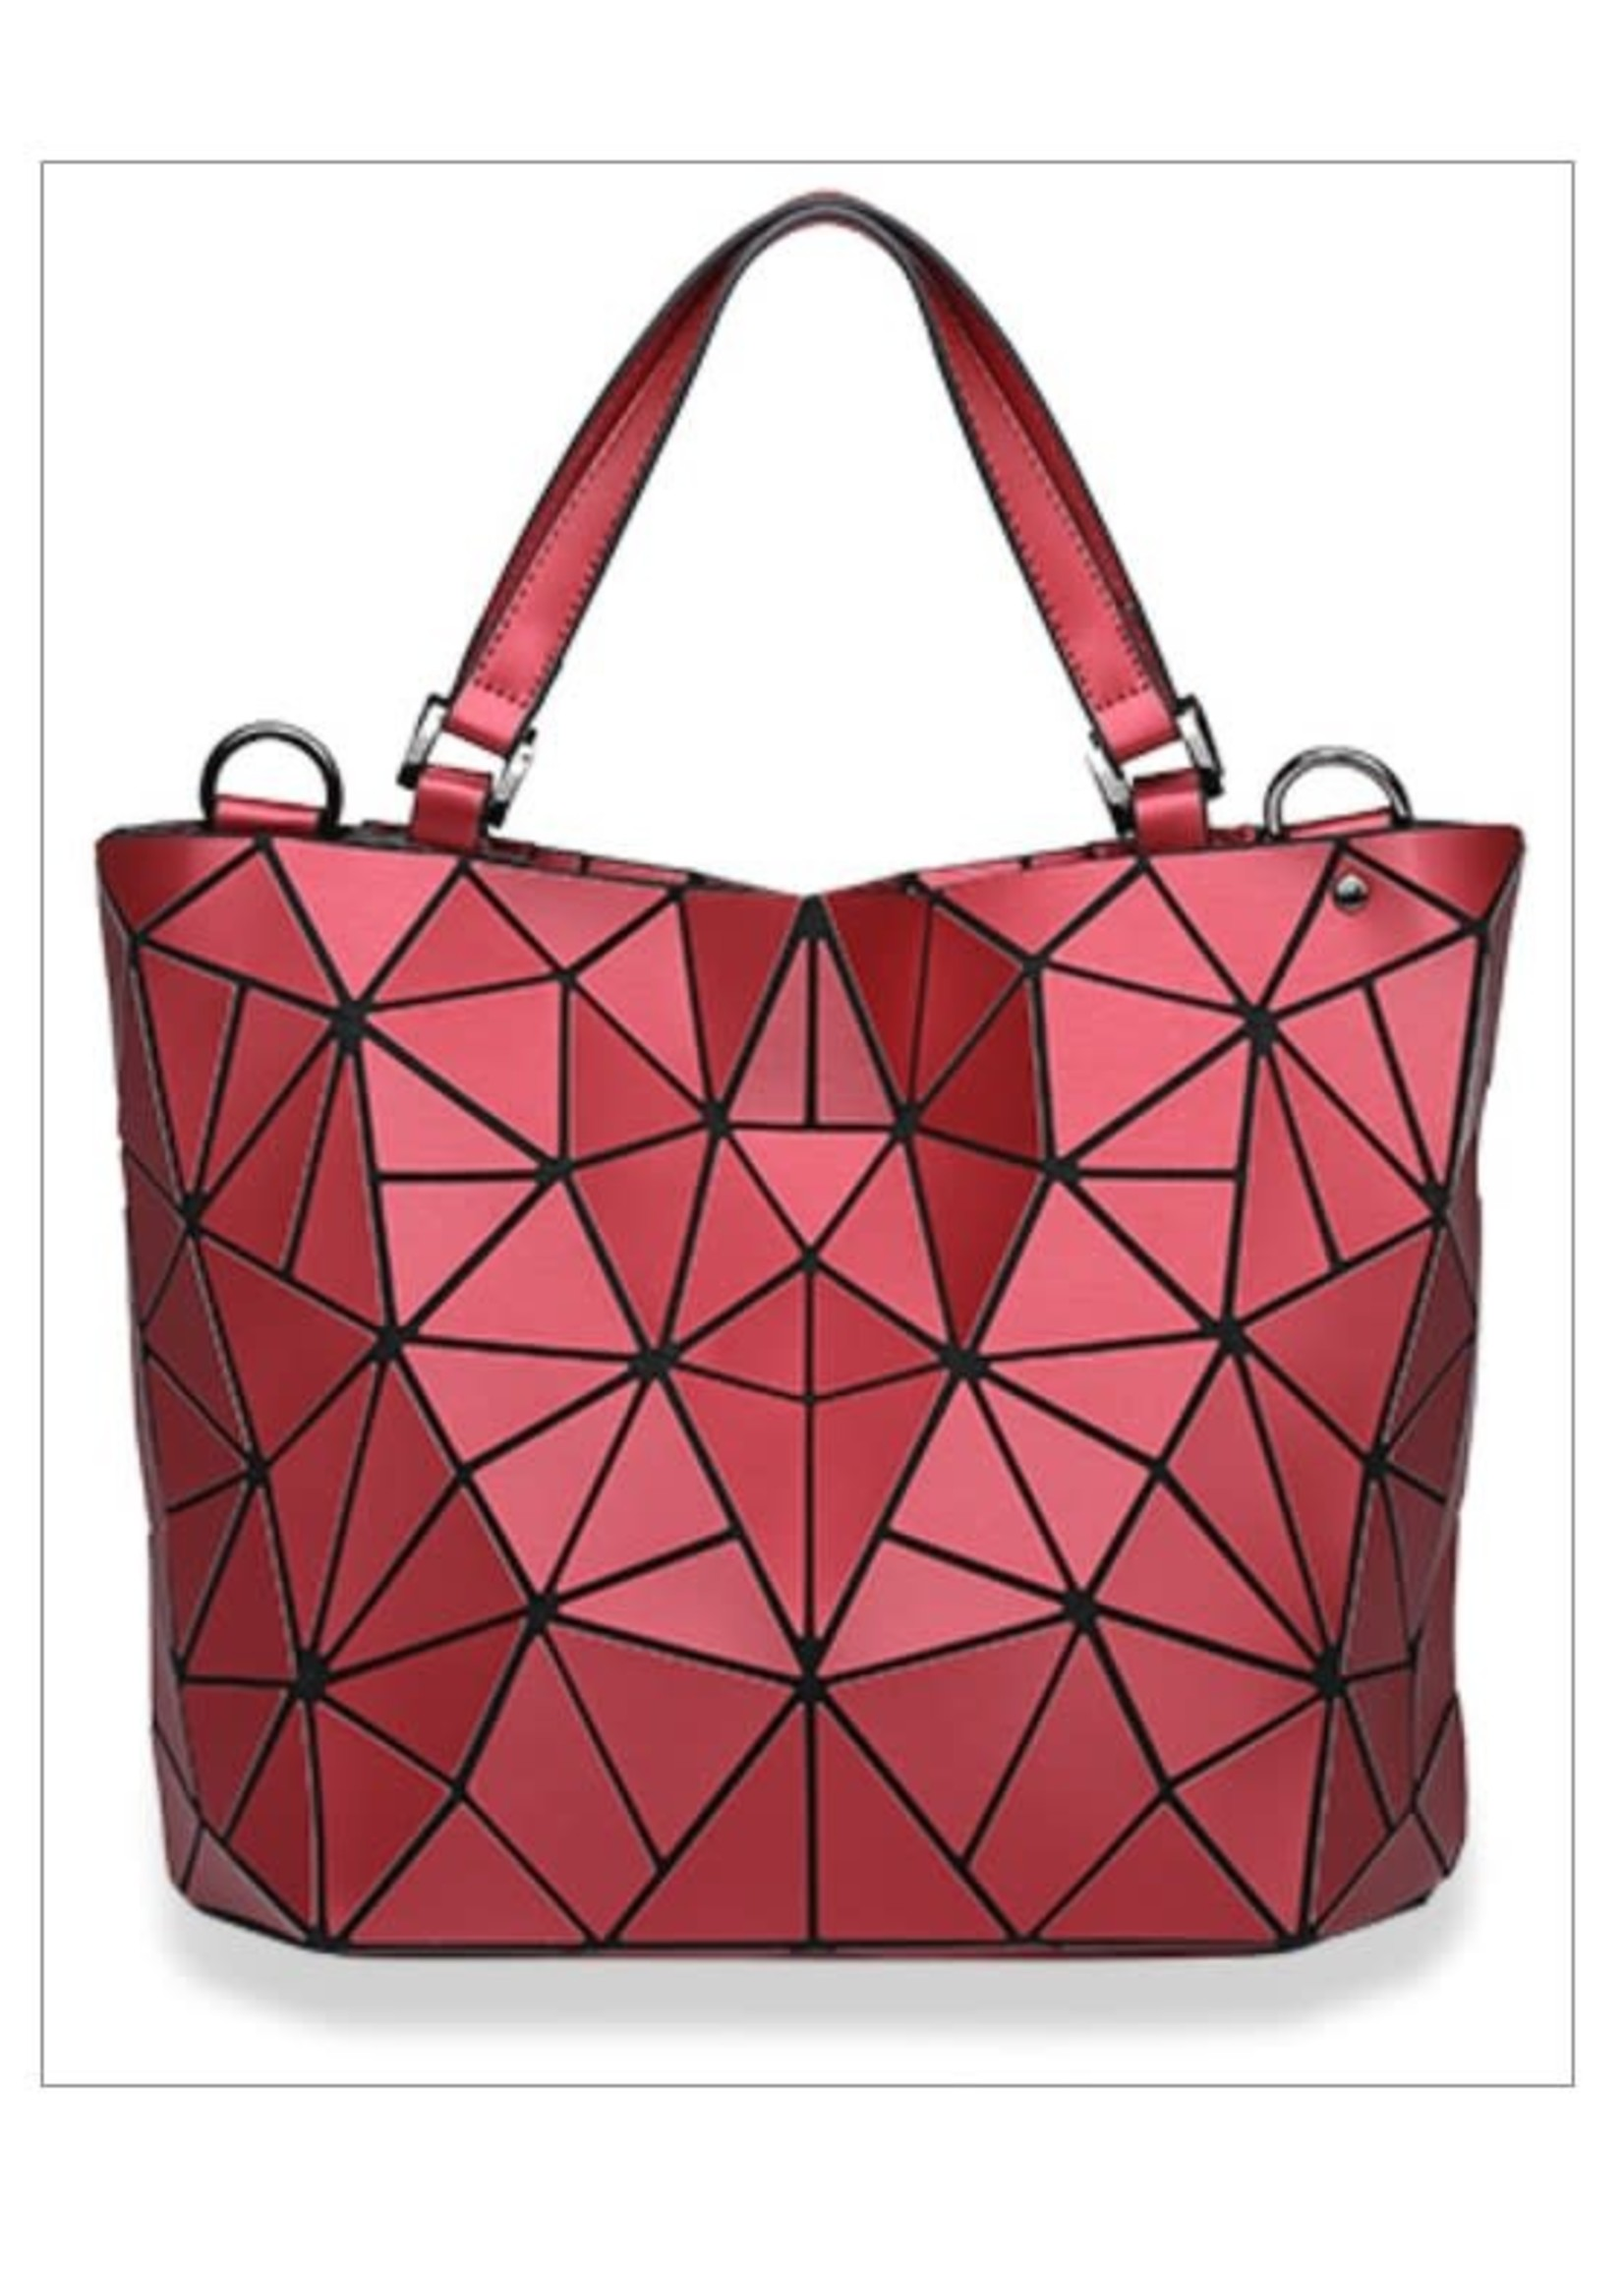 KDX Matte Prism Tote Handbag Stunning Red